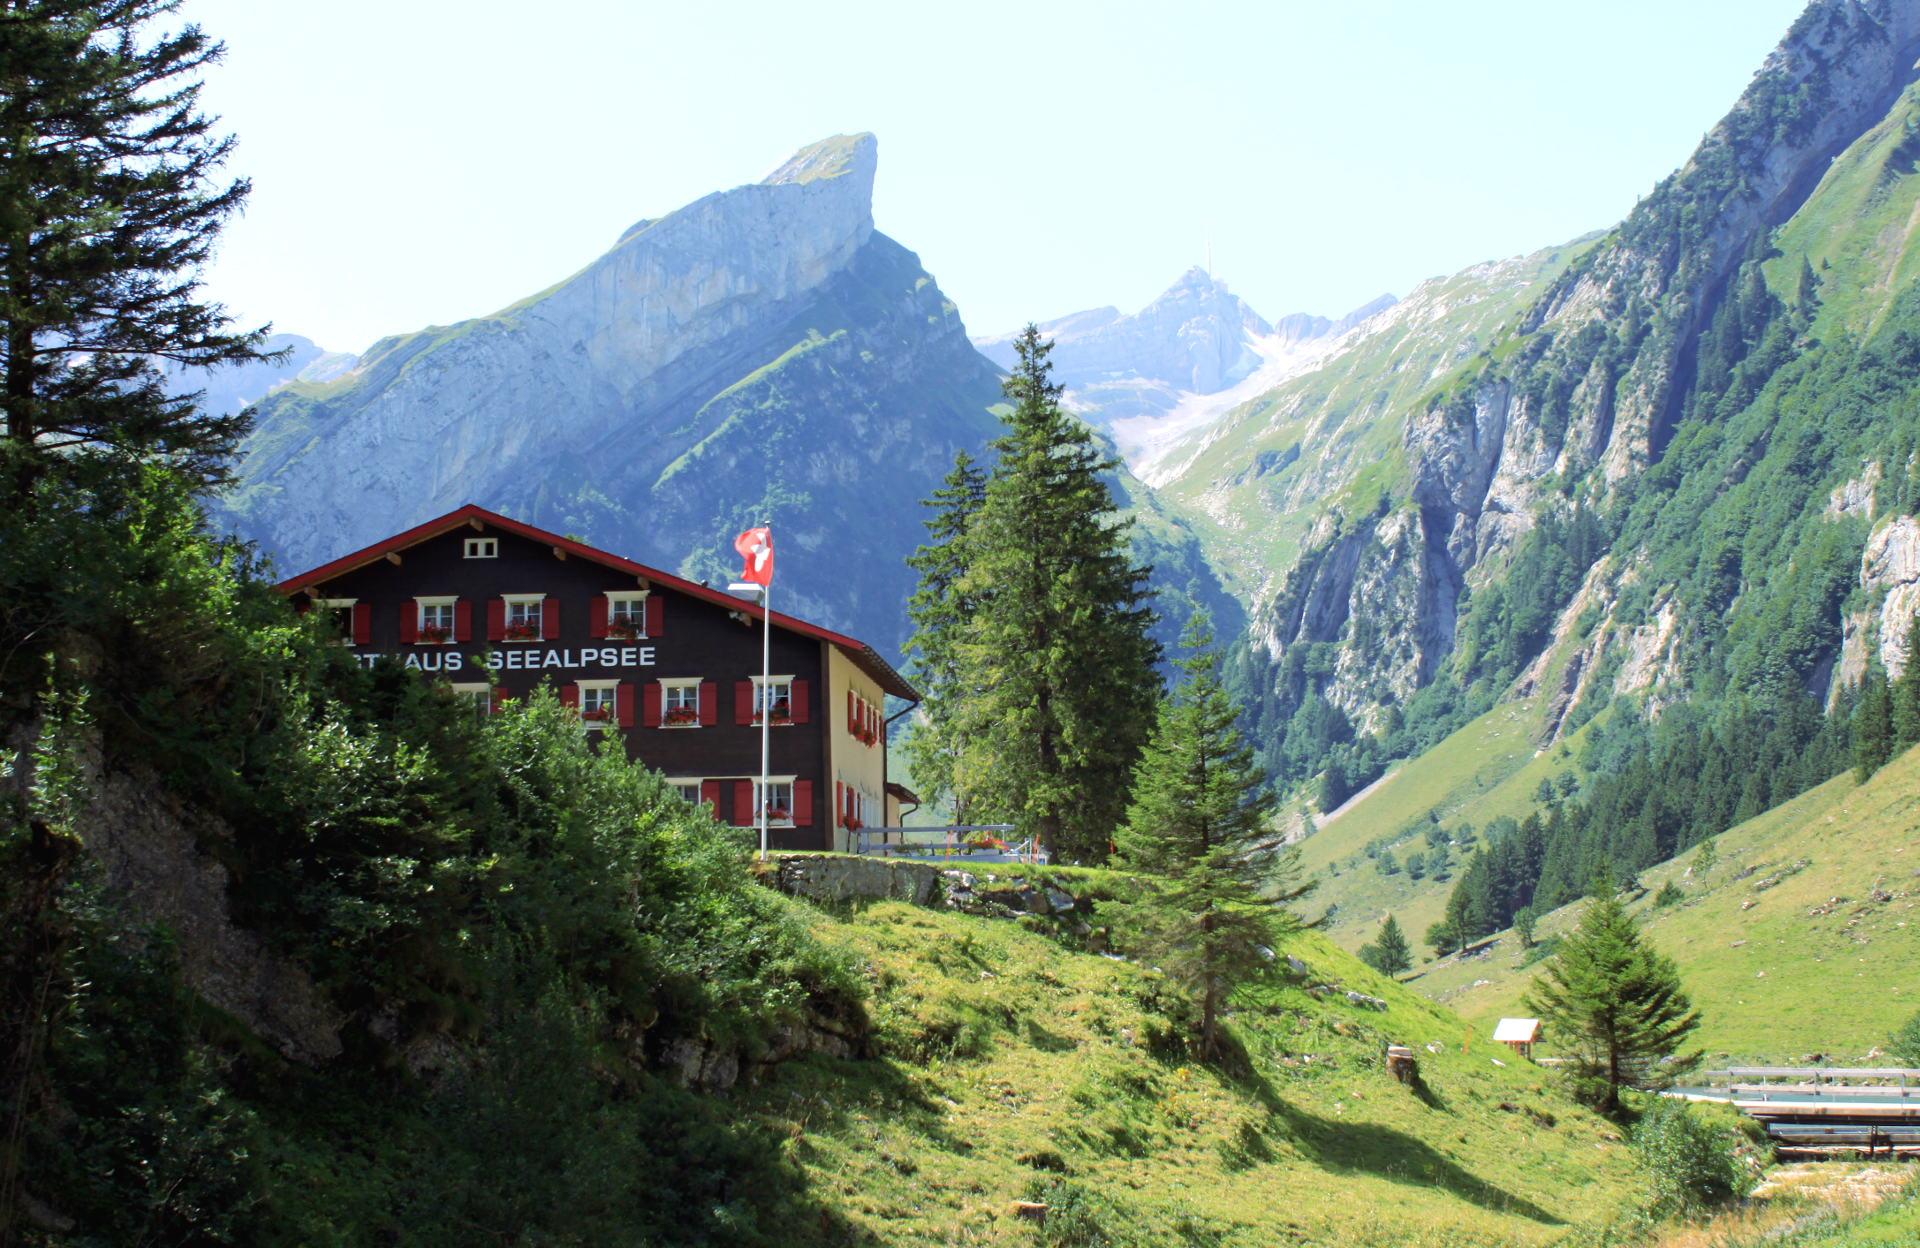 szwajcaria seealpsee szlak natura iglawpodrozy